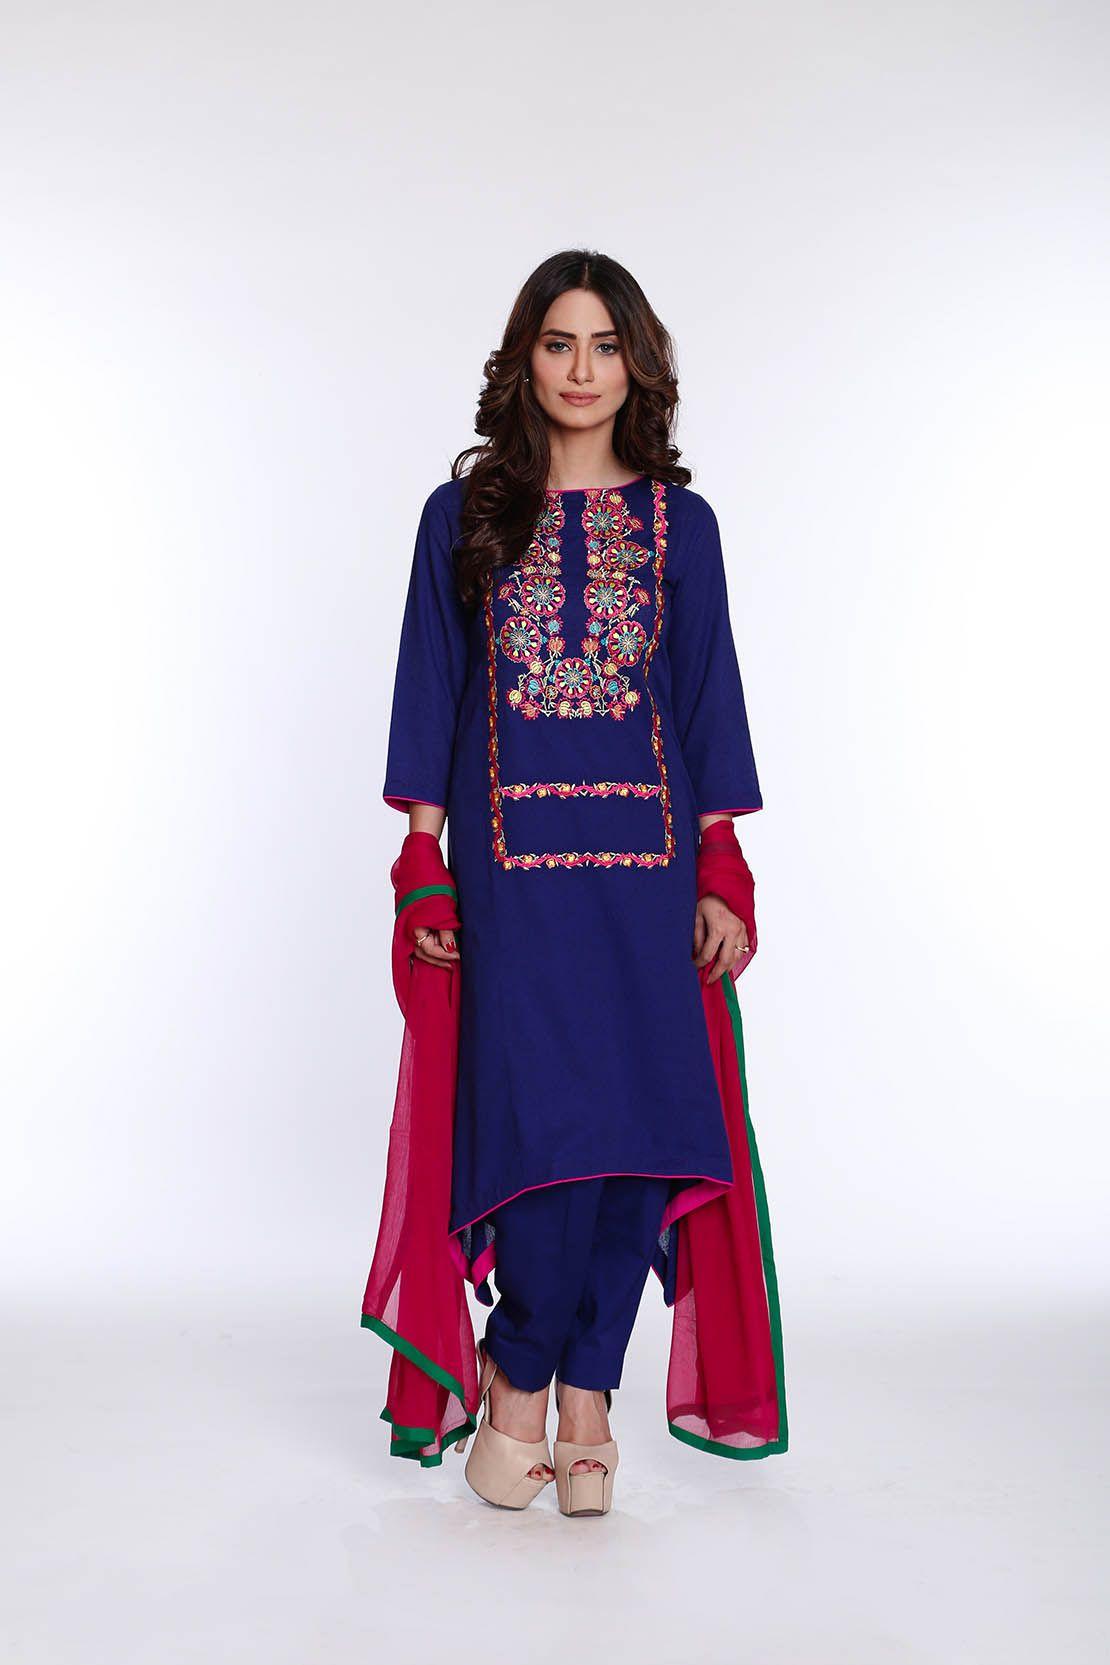 9db0cd5d4b Rang Ja Latest Colorful Kurti Dresses 2019-2020 Eid Collection ...